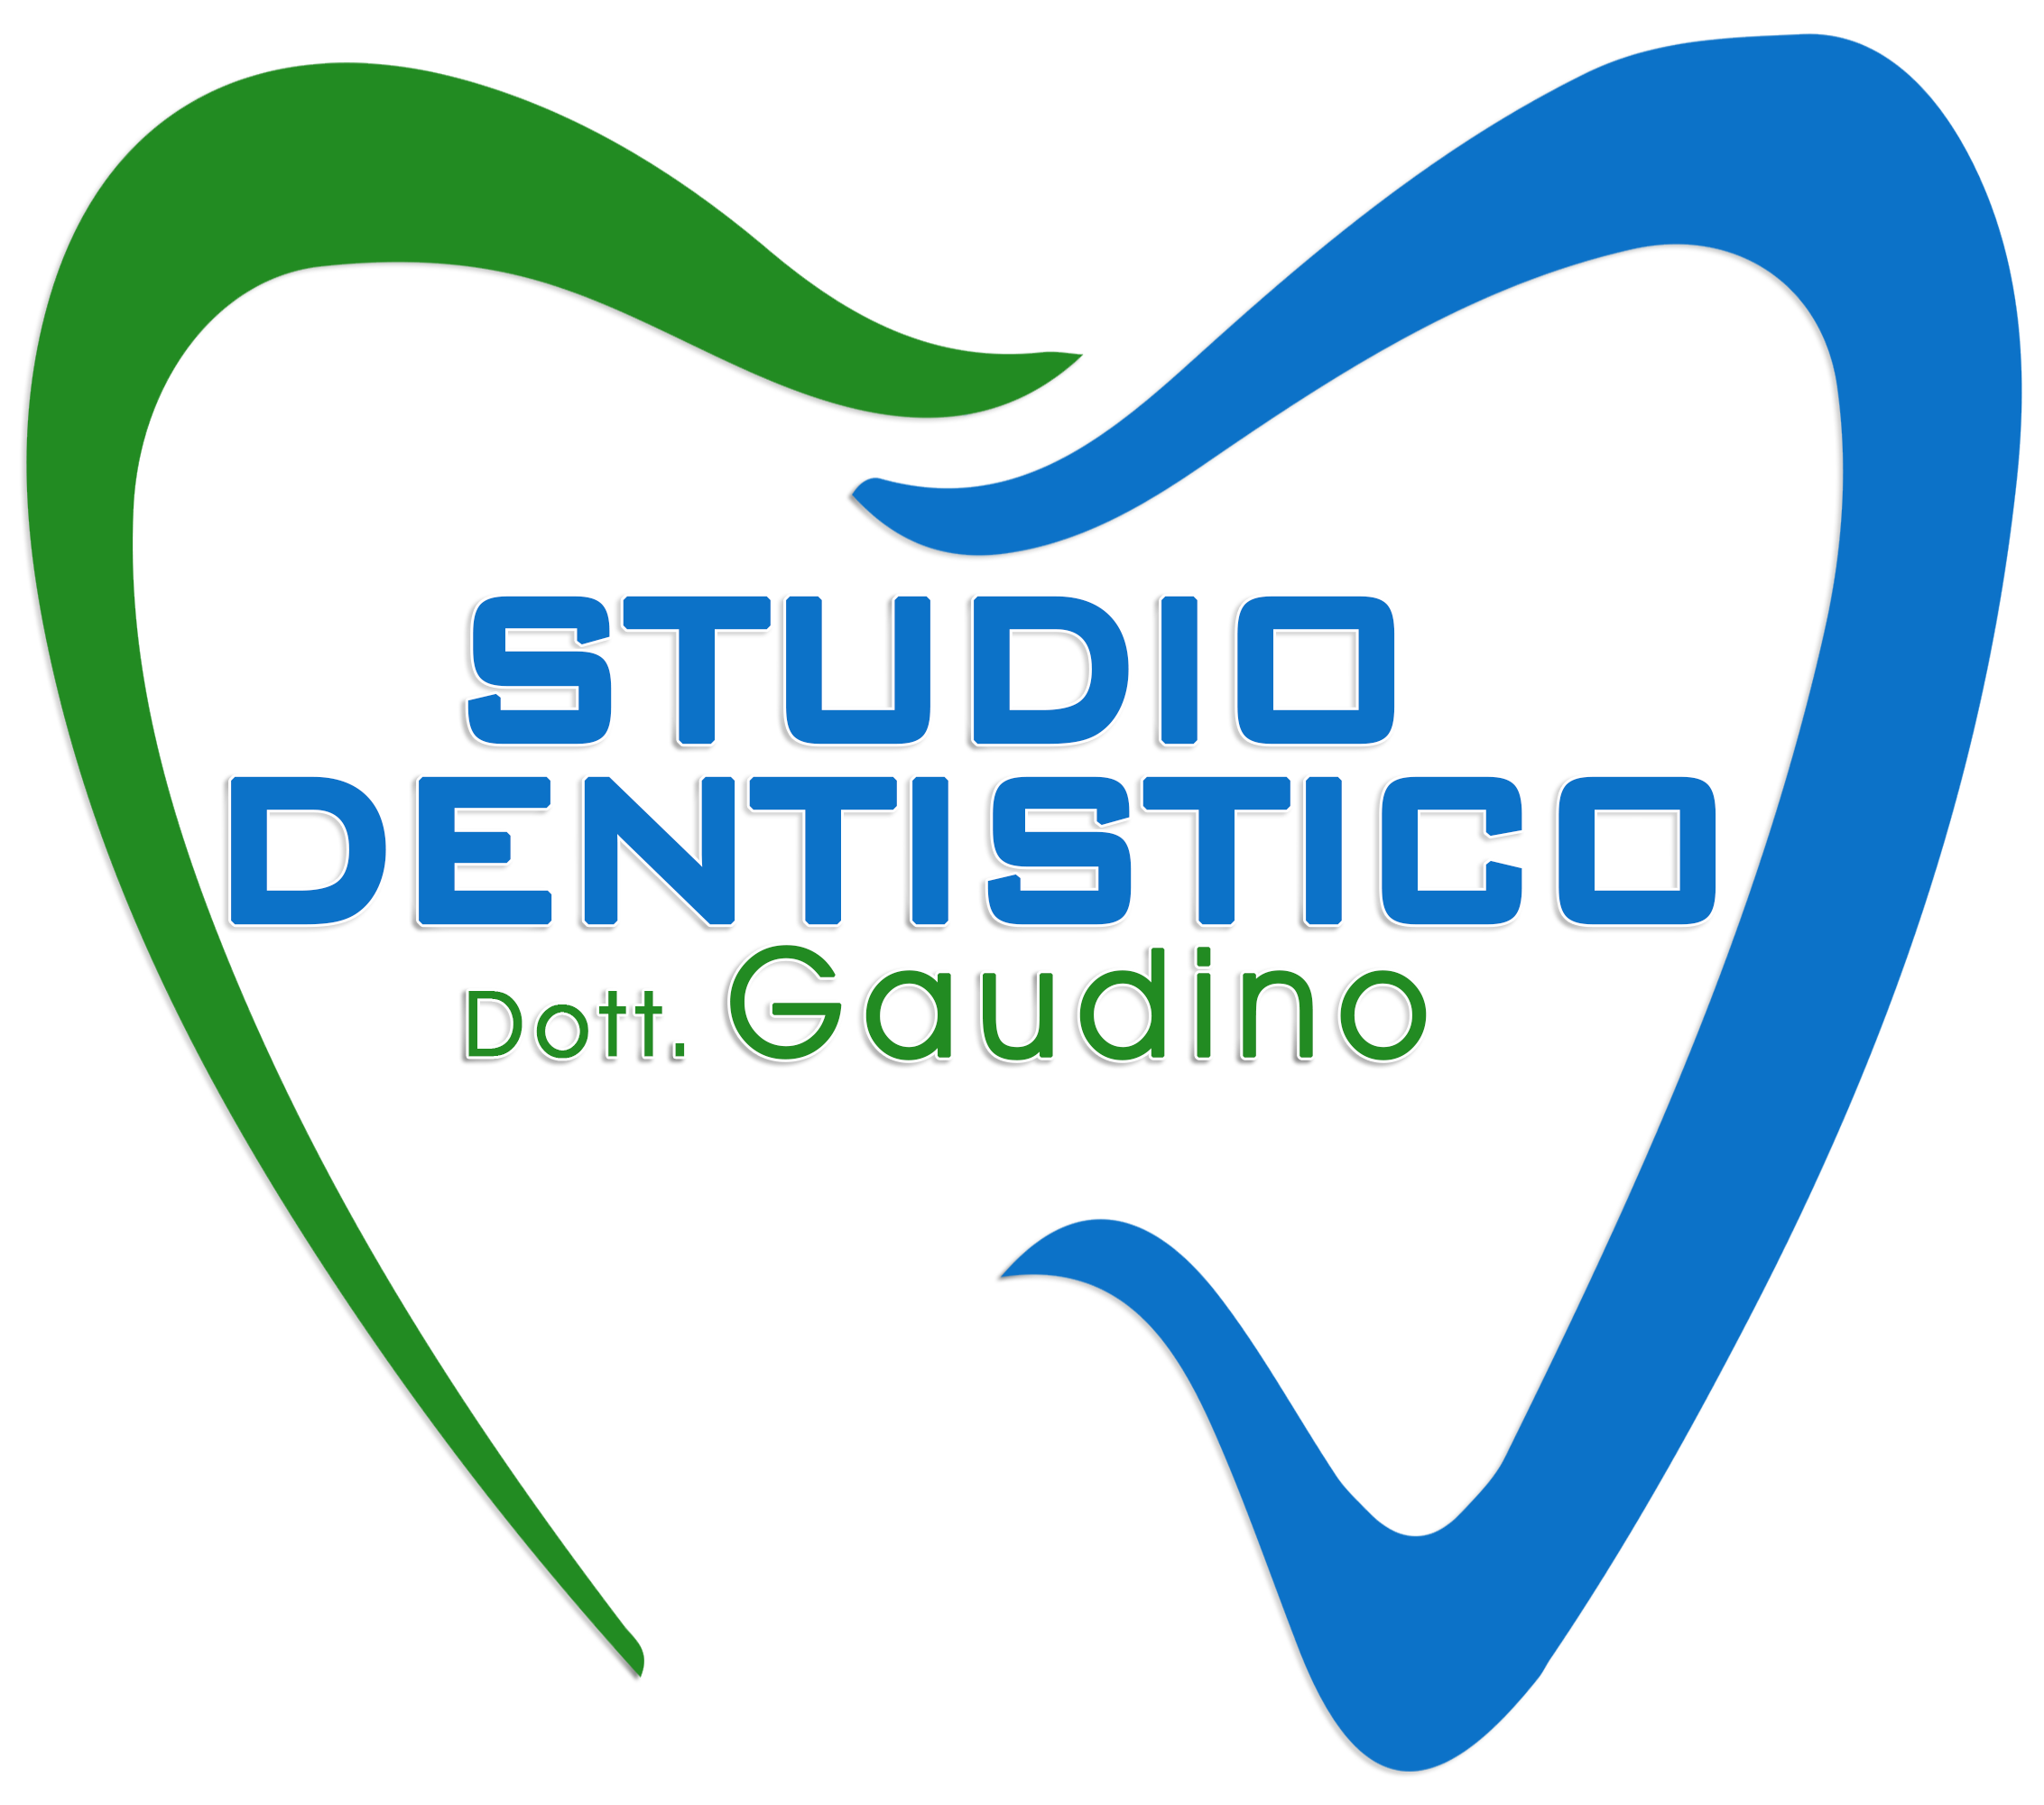 logo tabella mod - Studio Dentistico Gaudino